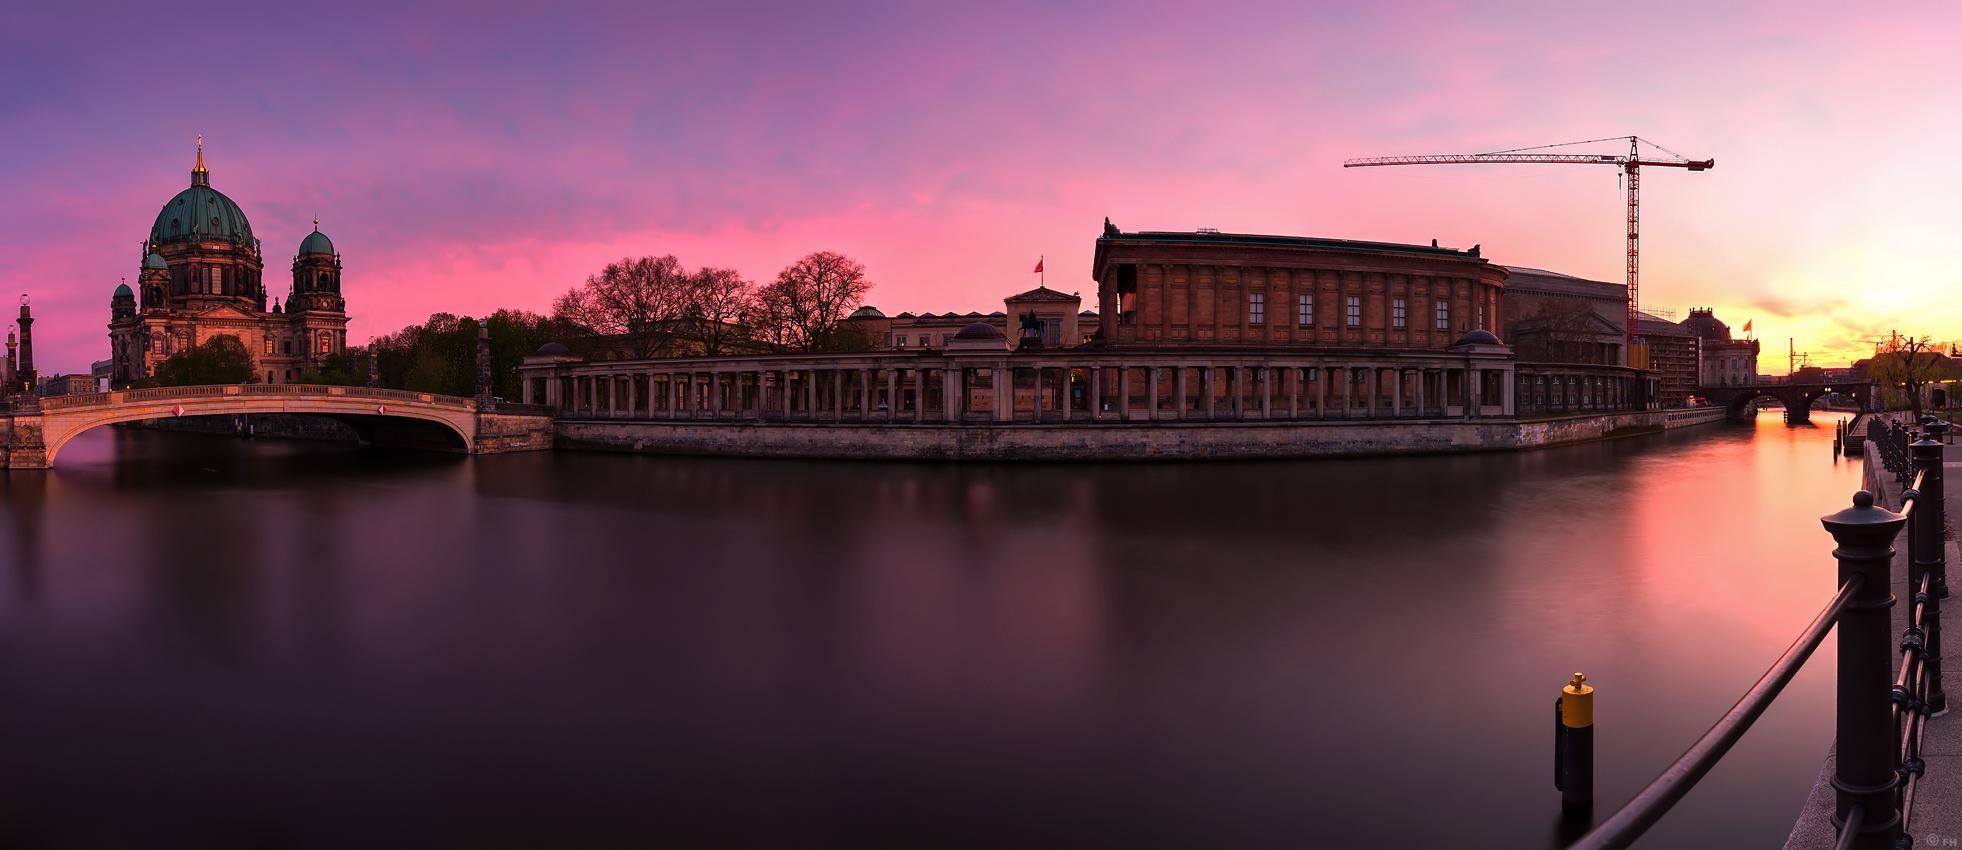 Fhmedien De Museumsinsel Berlin Skyline Panorama